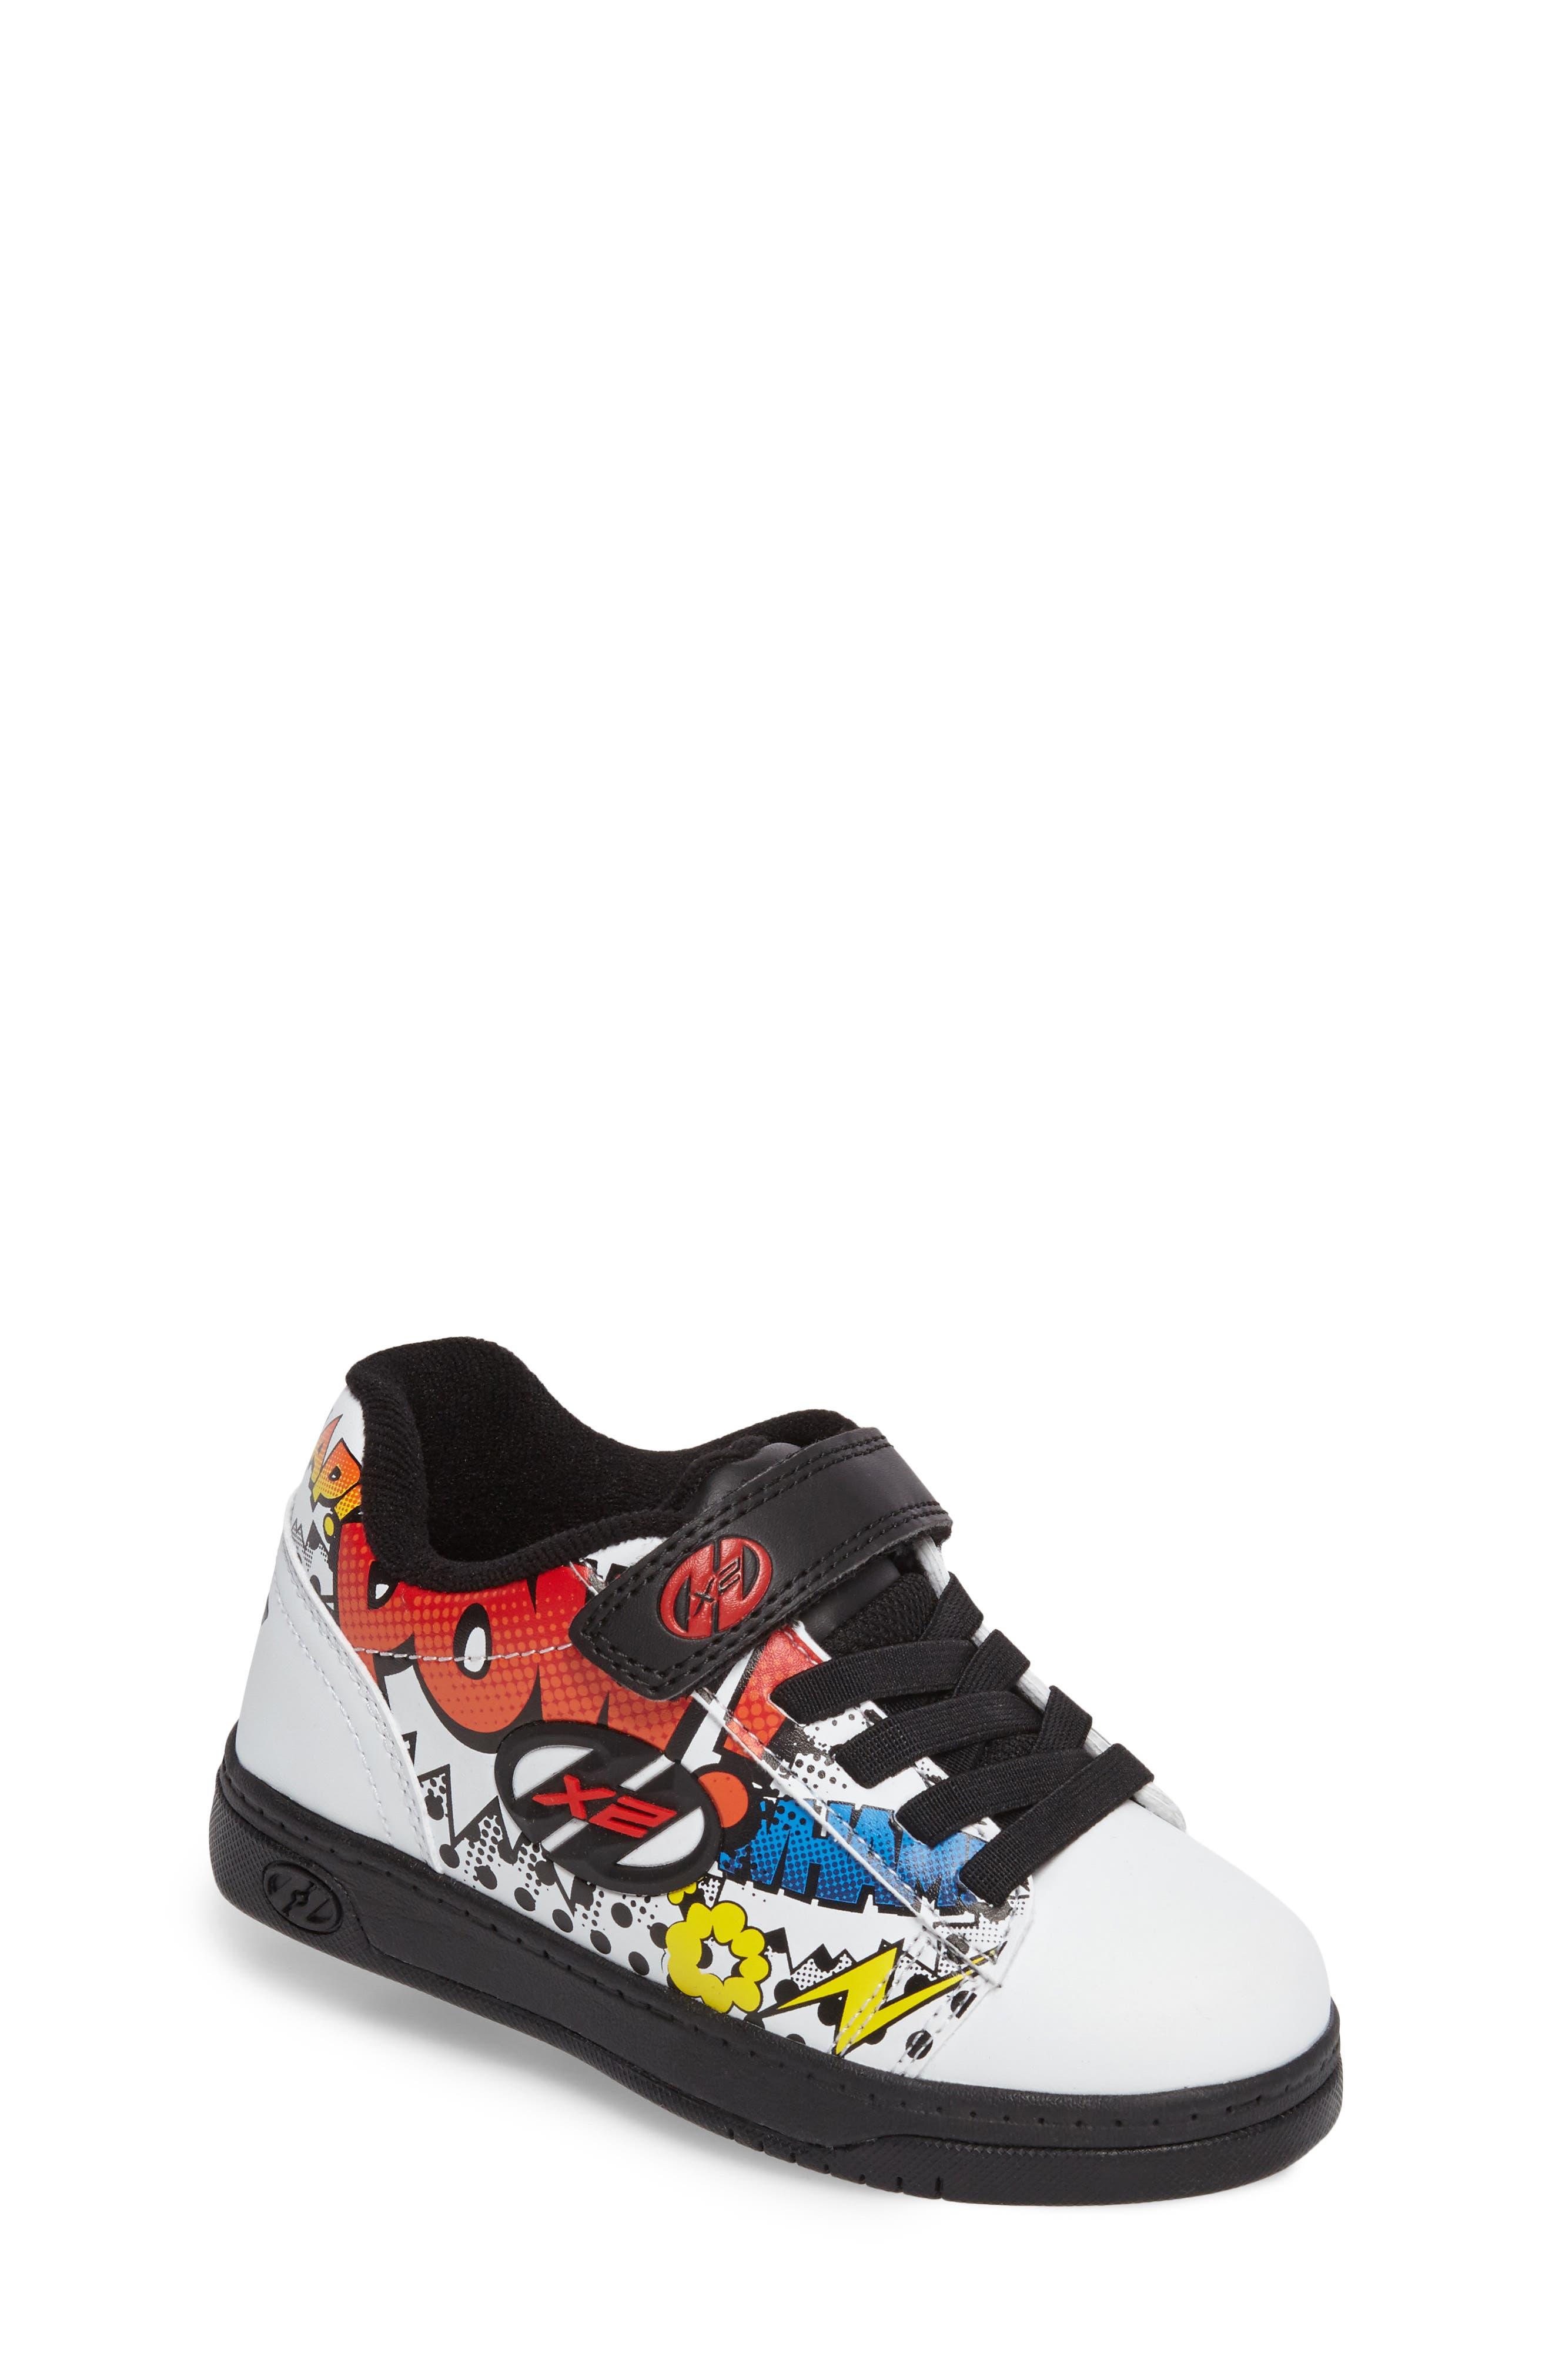 Alternate Image 1 Selected - Heelys Dual Up X2 Comic Sneaker (Toddler, Little Kid & Big Kid)